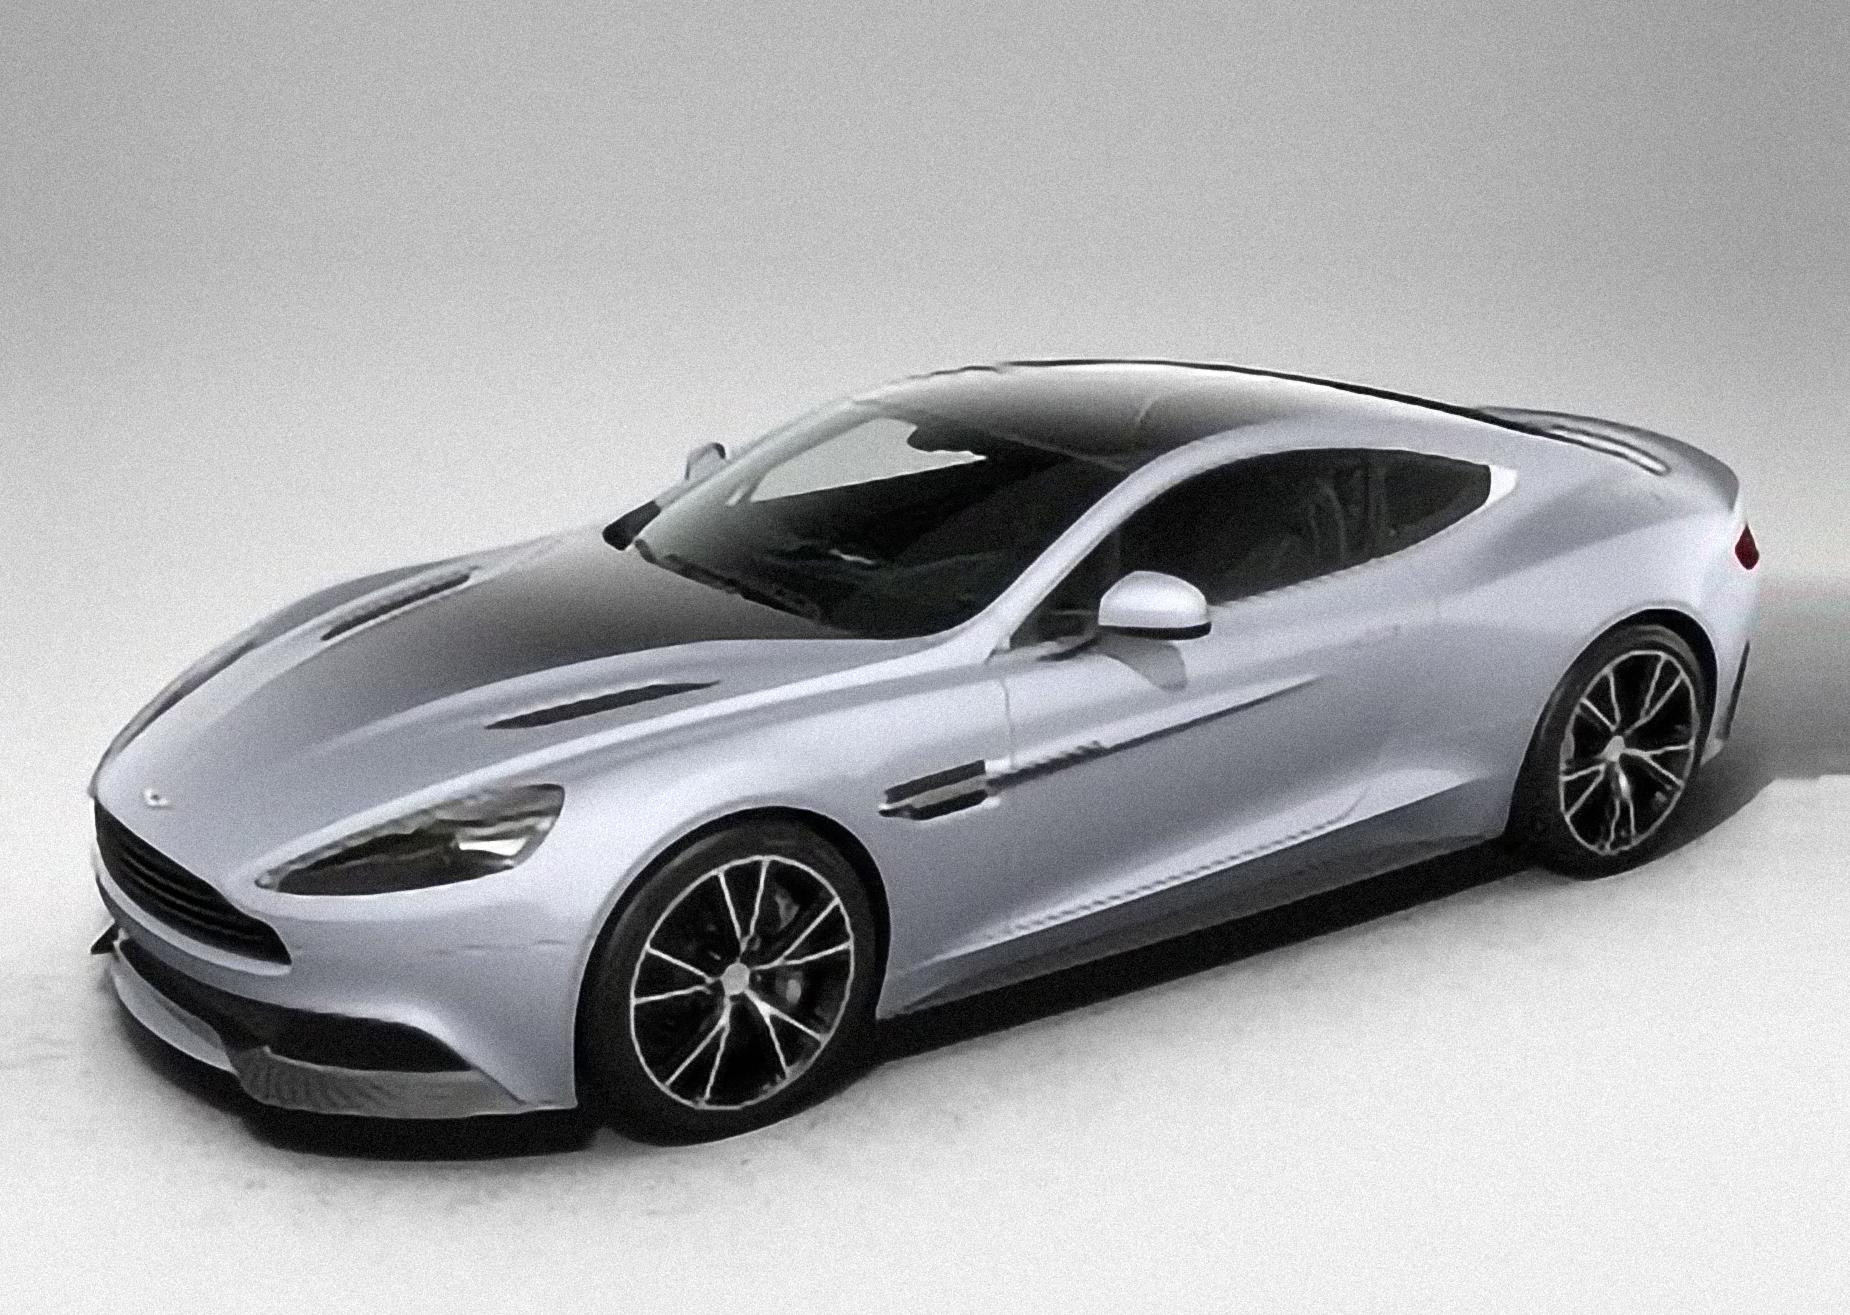 Aston Martin, V12 Vanquish, VH [2011 .. 2020] [EUDM] Coupe, AutoDir